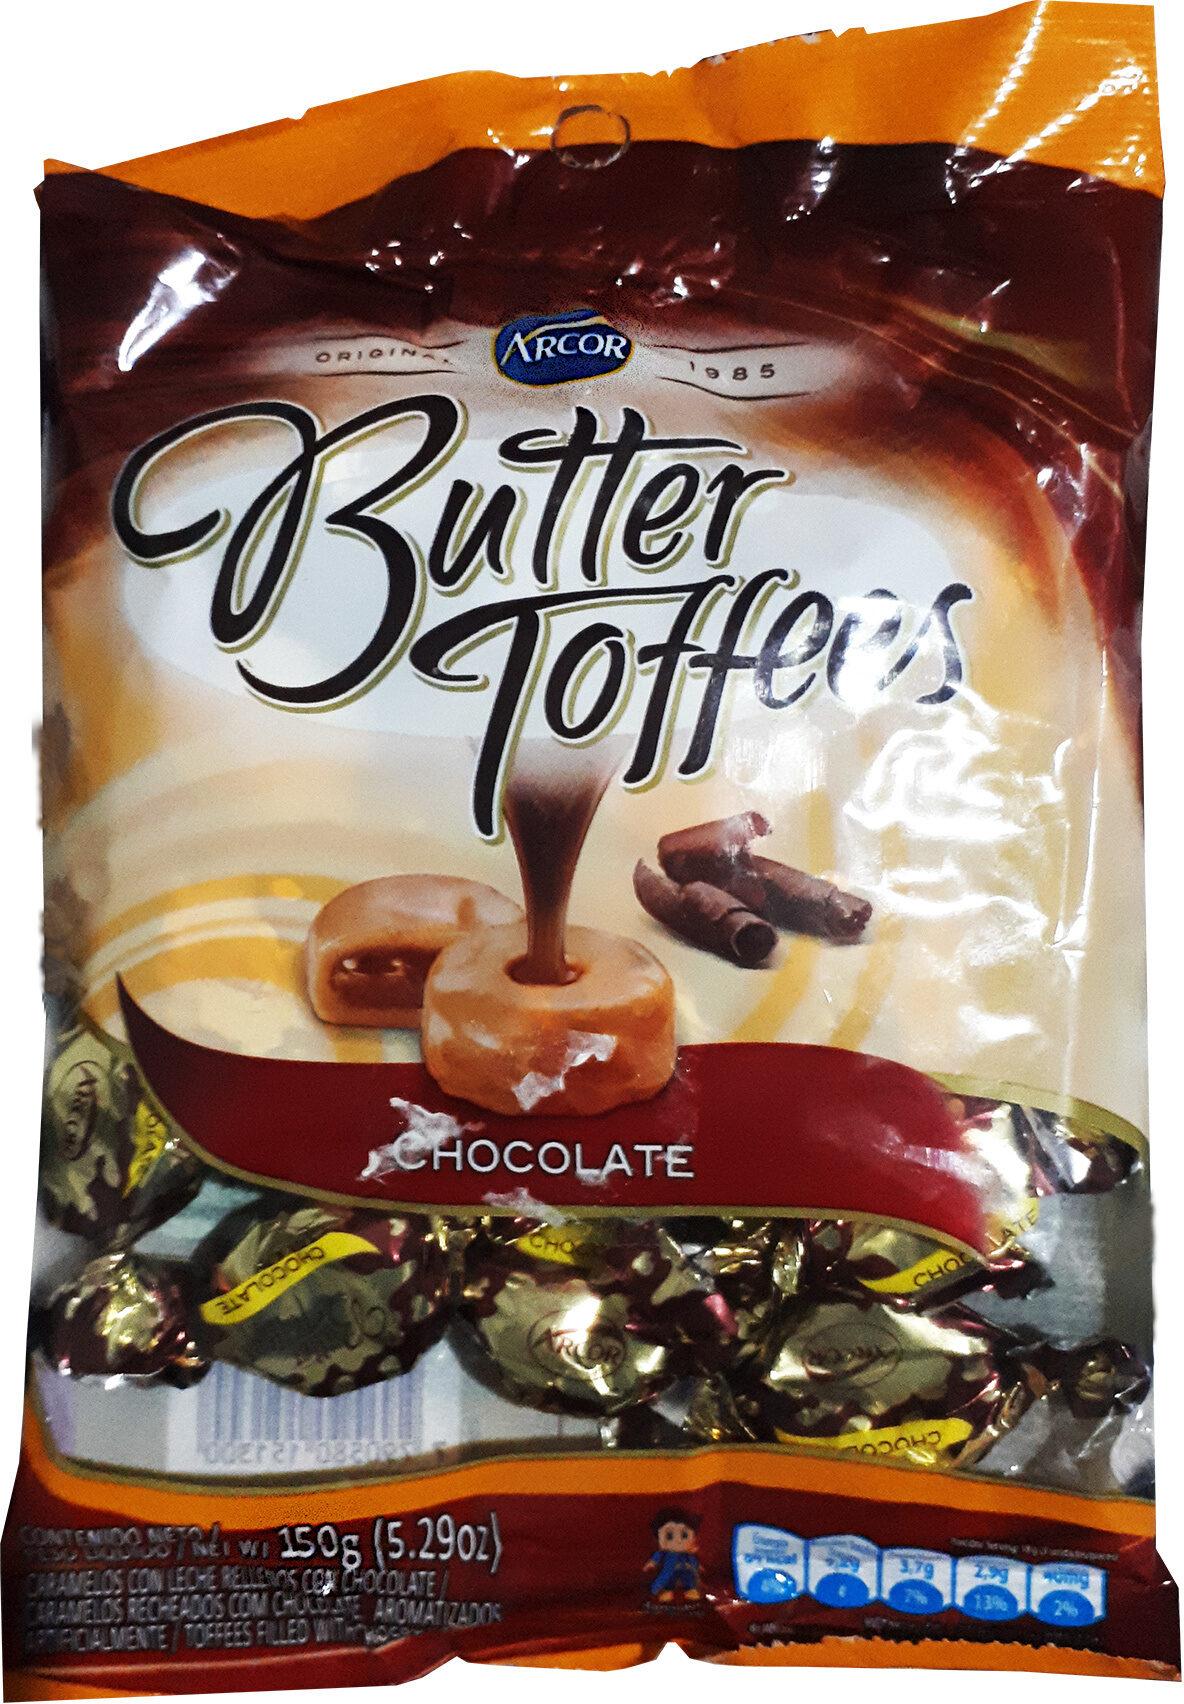 Butter Toffees Chocolate - Produto - en